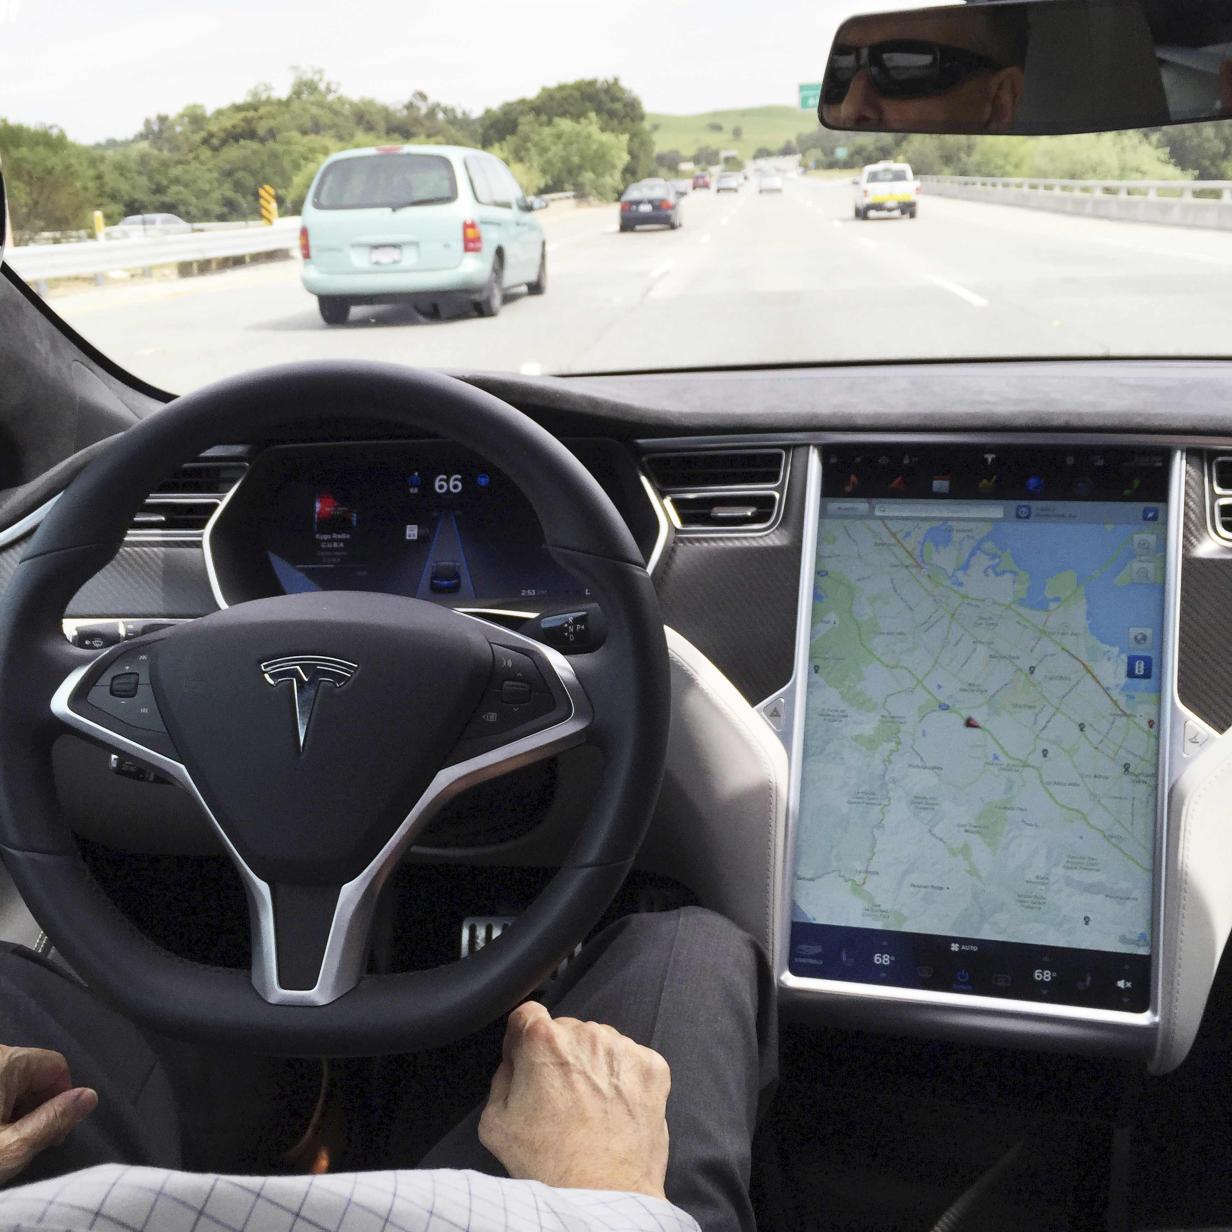 US-Politiker verwendet Tesla-Autopilot falsch